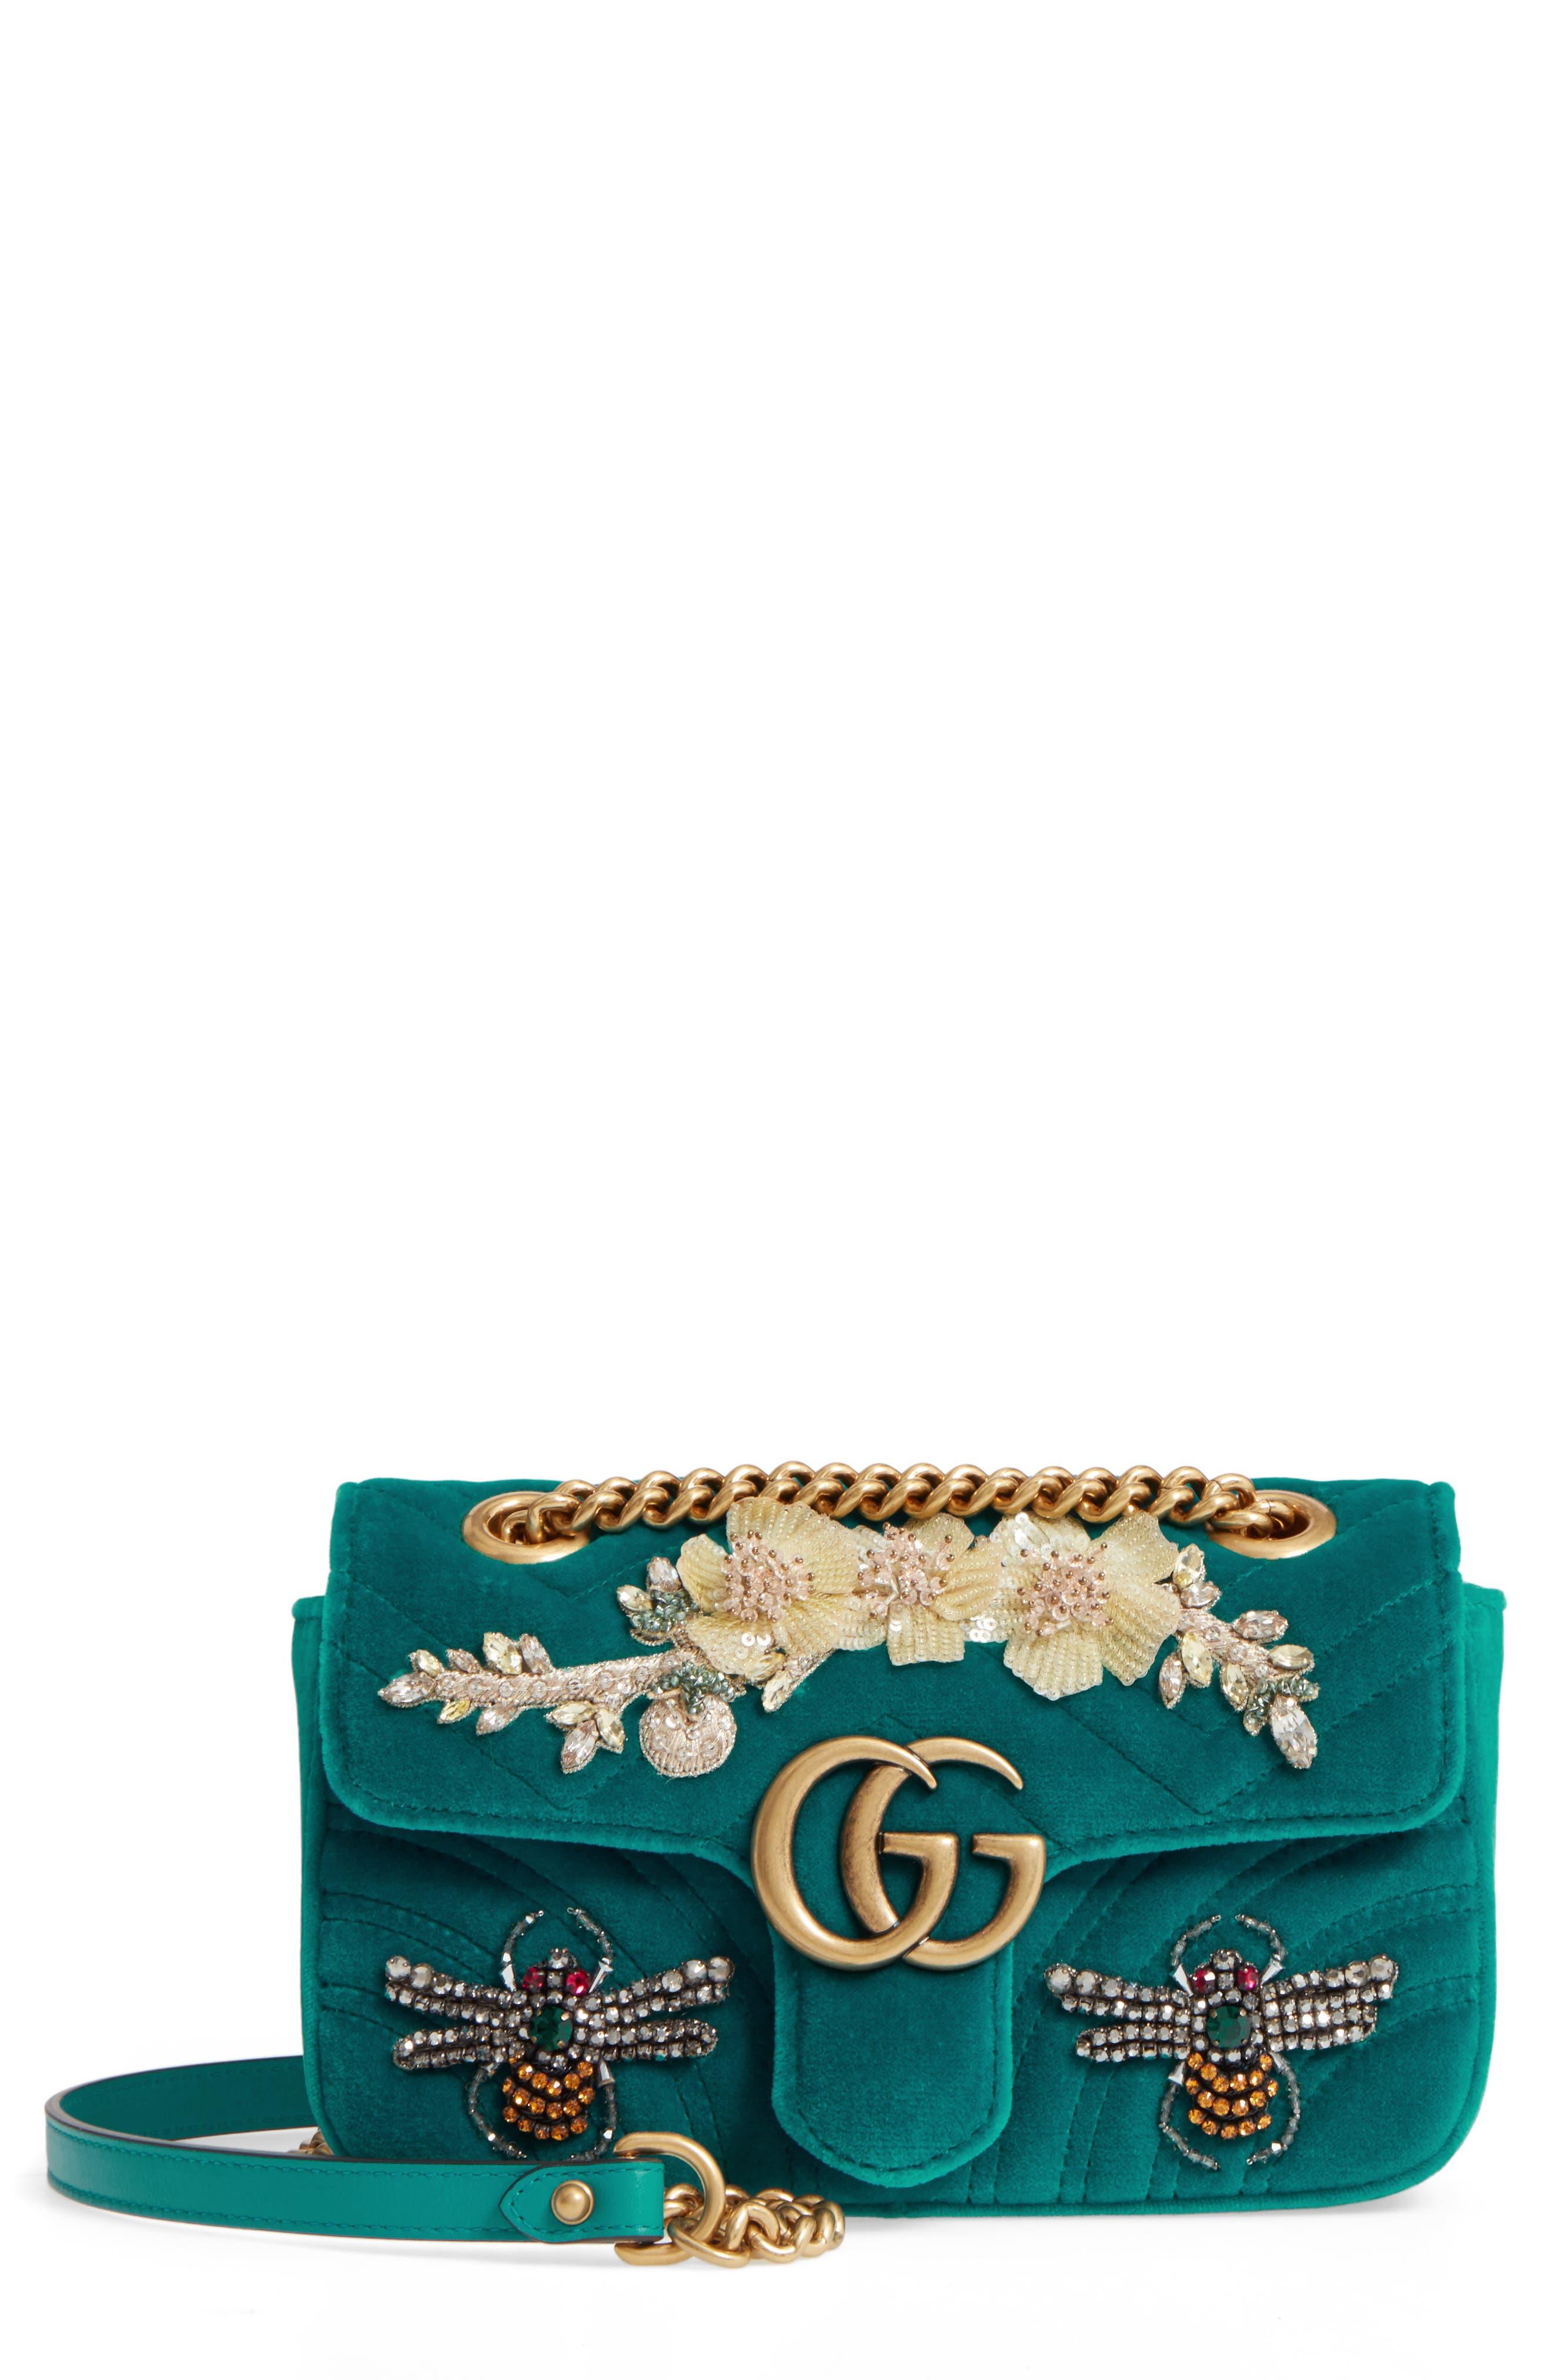 Mini GG Marmont Matelassé Velvet Shoulder Bag,                         Main,                         color, PIVONE